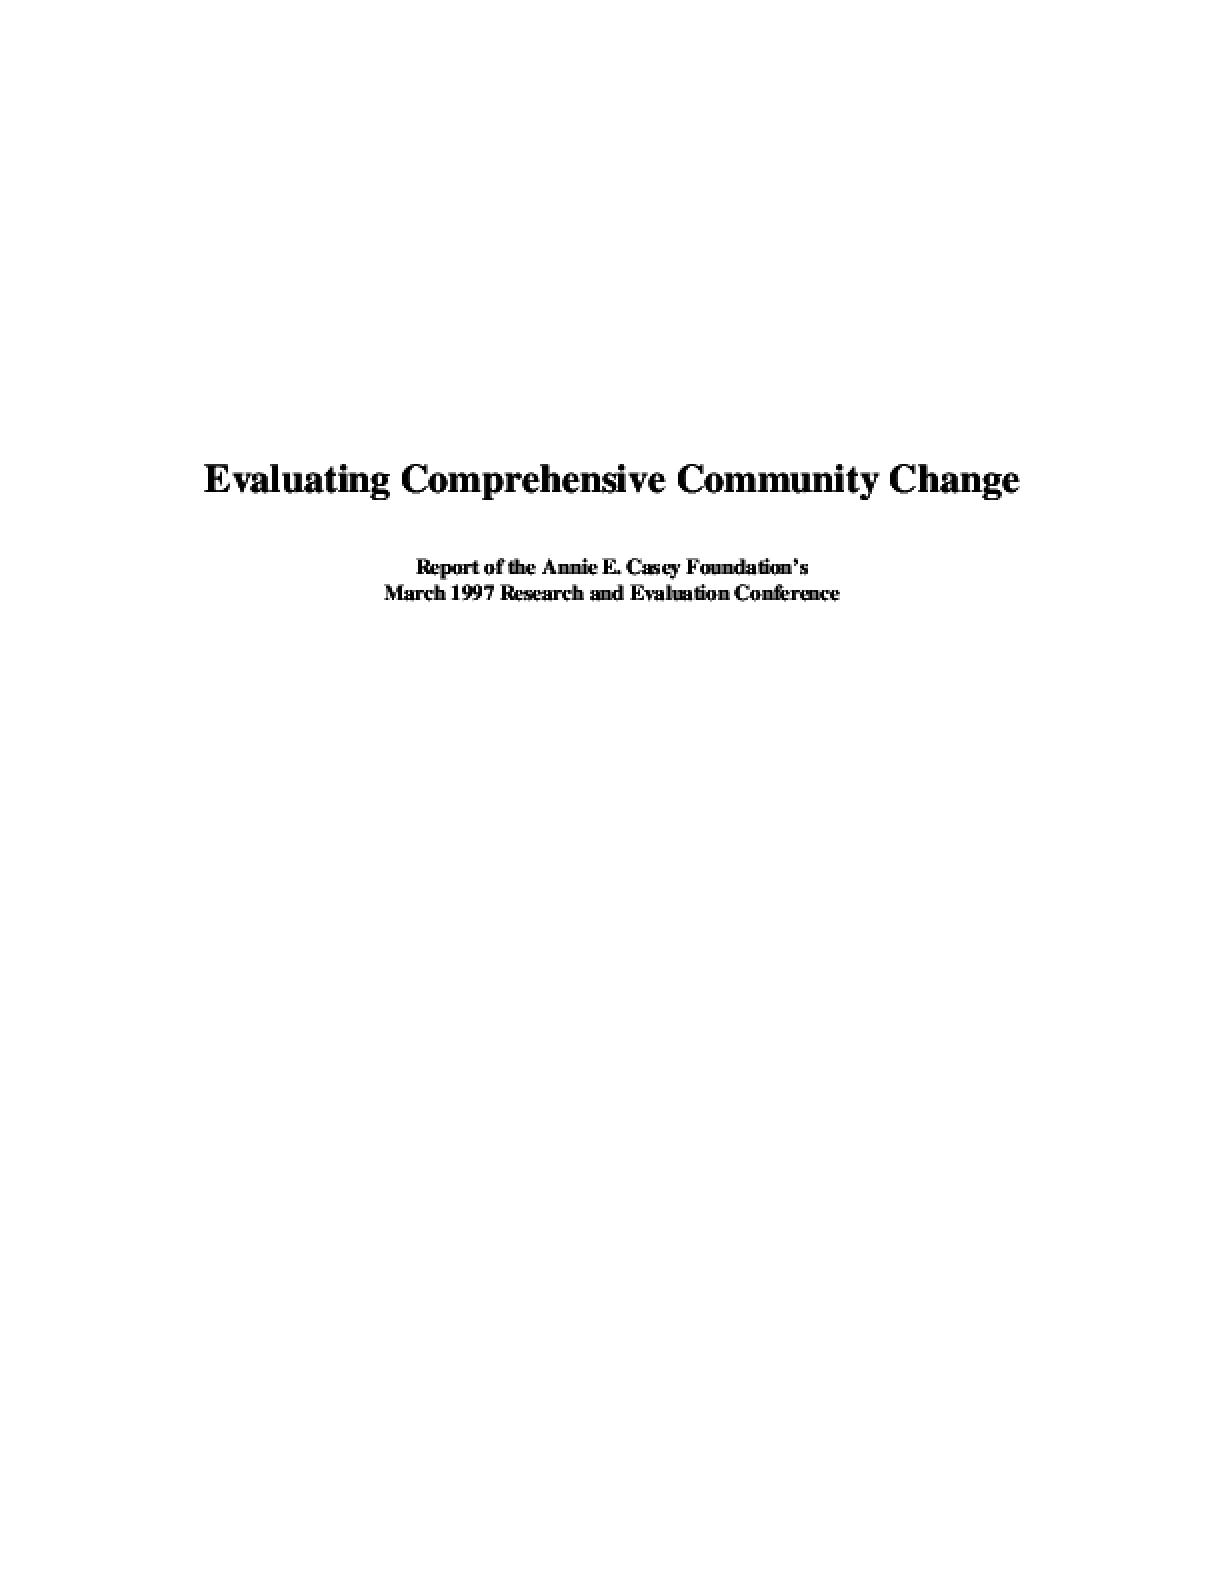 Evaluating Comprehensive Community Change